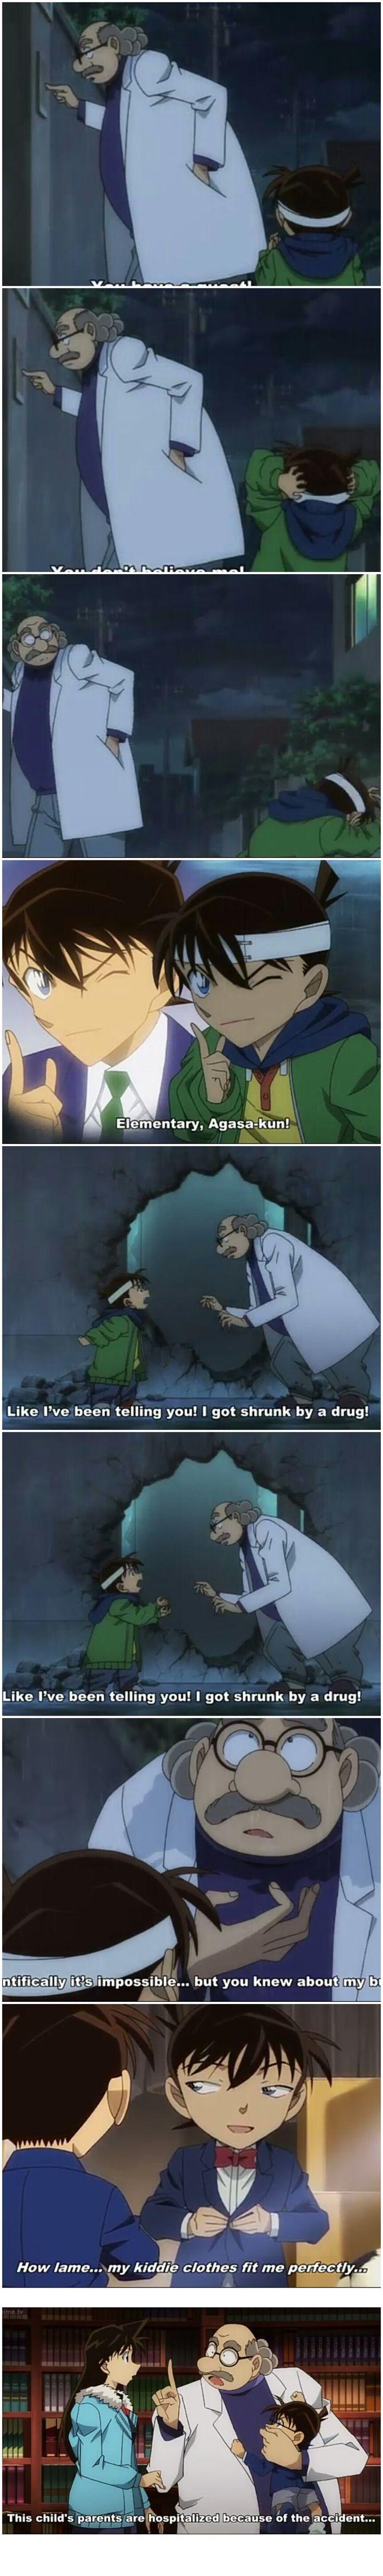 Shinichi, explaining his situation